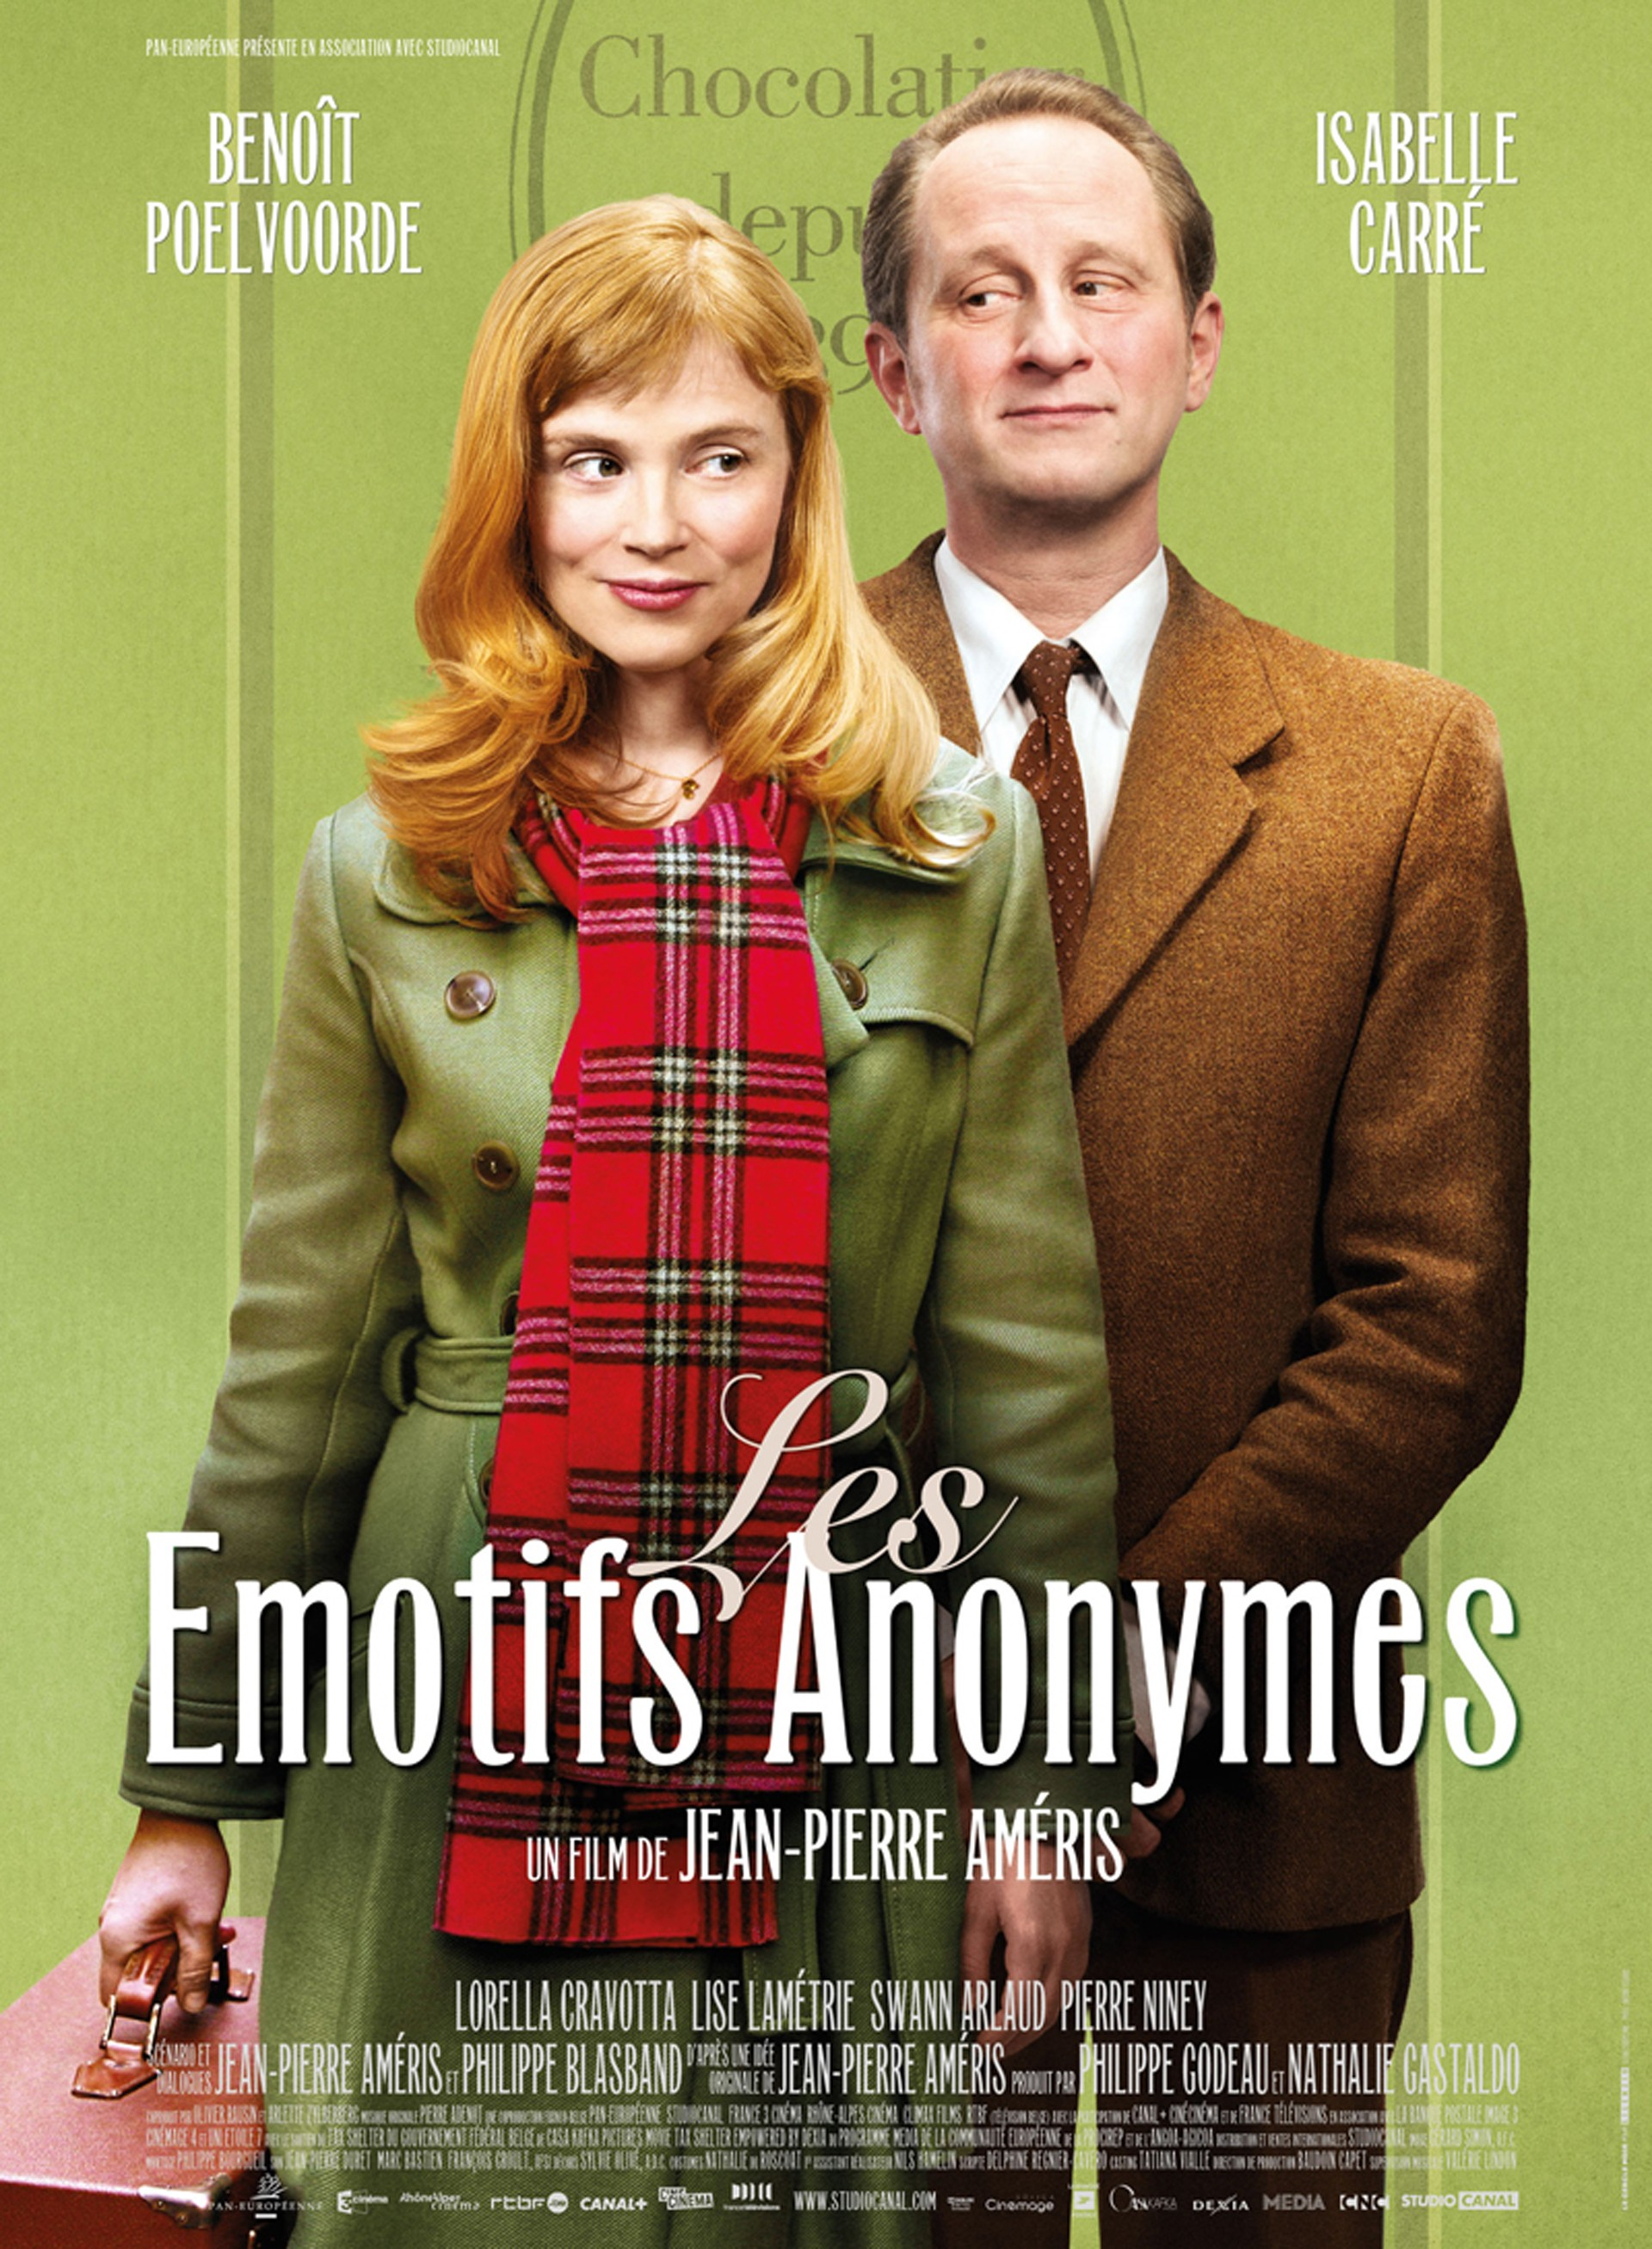 les emotif anonymes